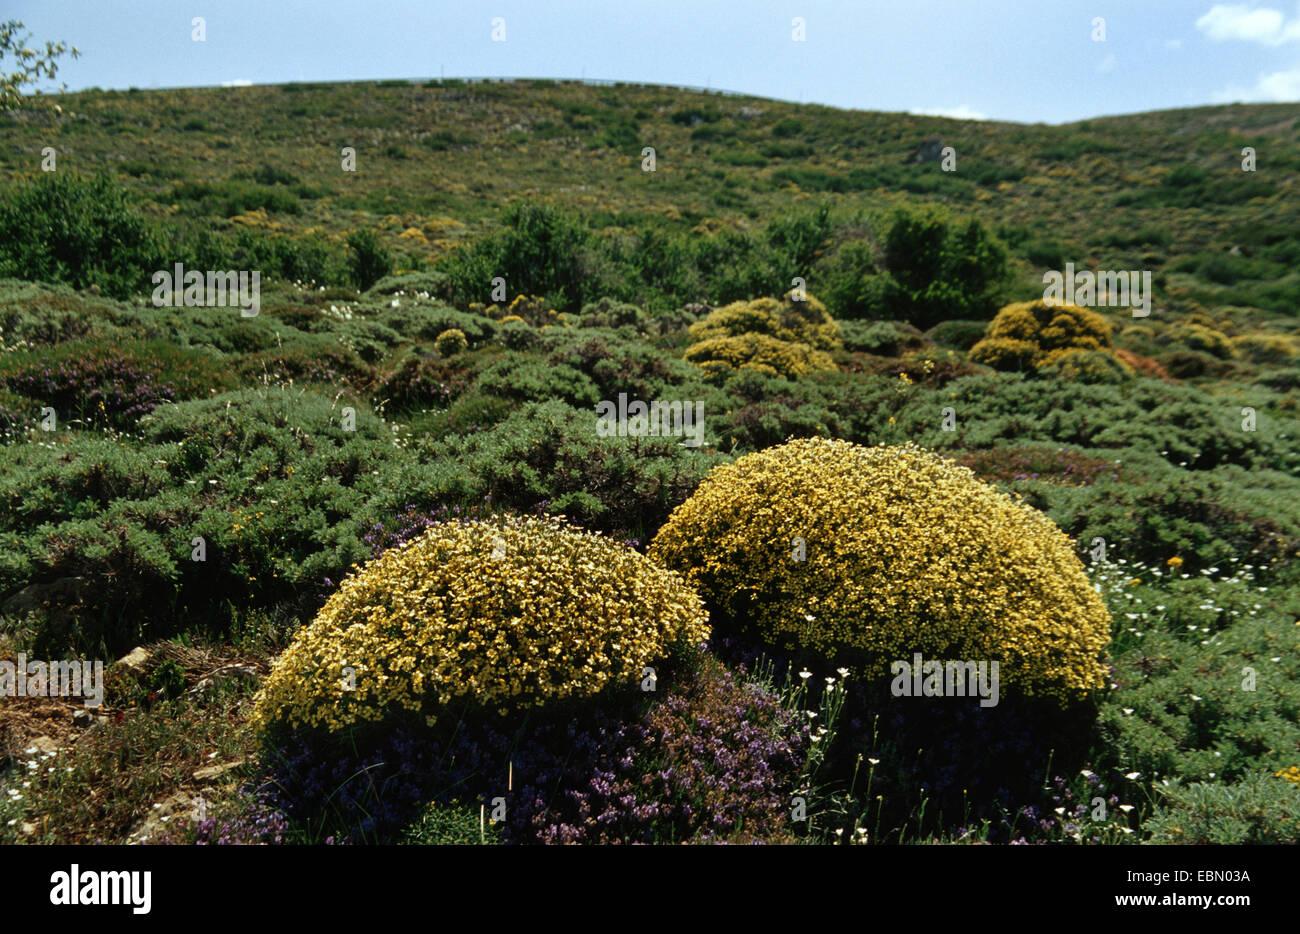 Vella (Vella spinosa), blooming, Spain, Andalusia, Sierra Nevada - Stock Image